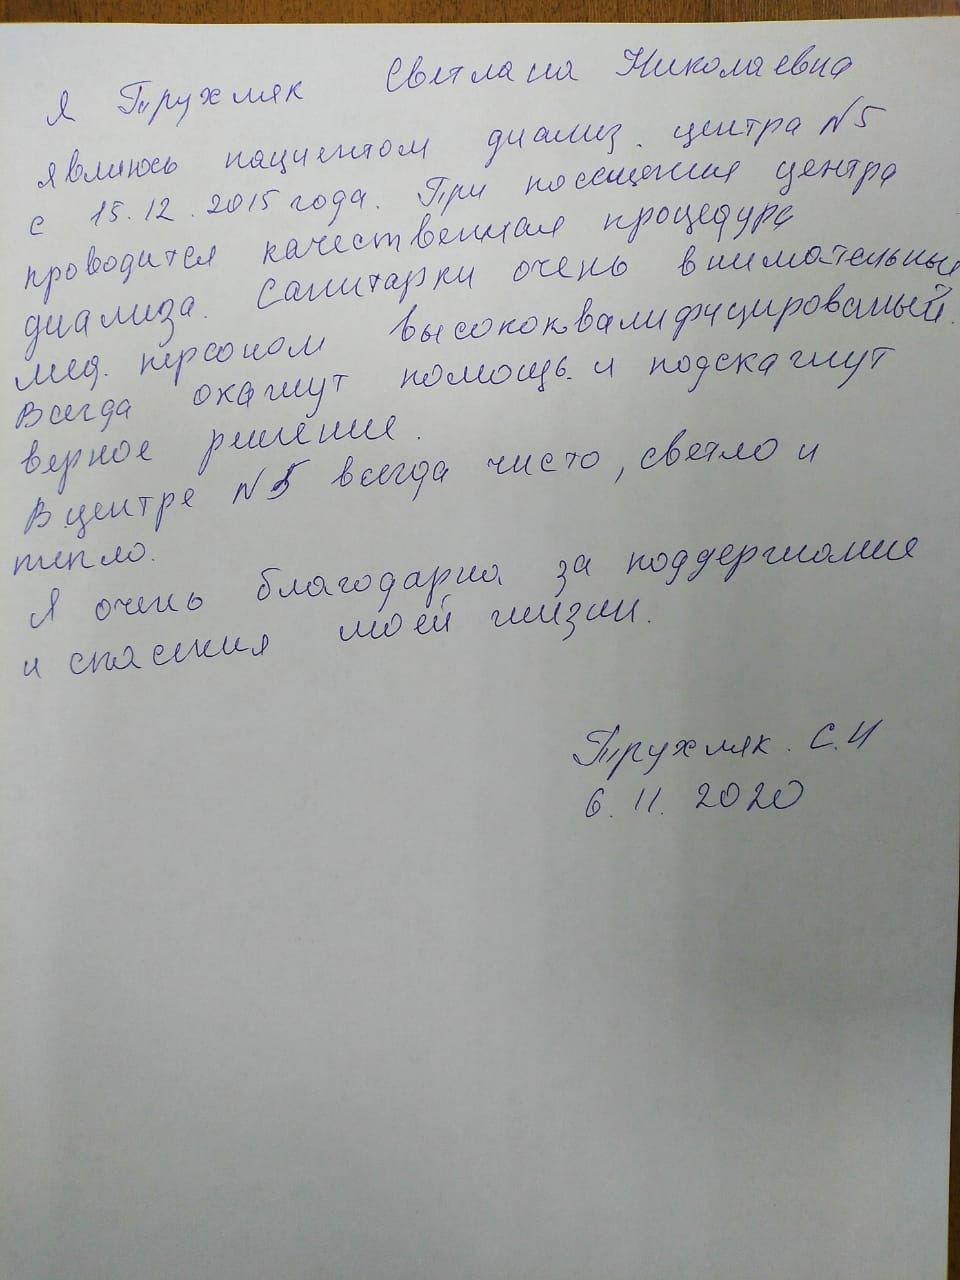 Трухляк С.Н